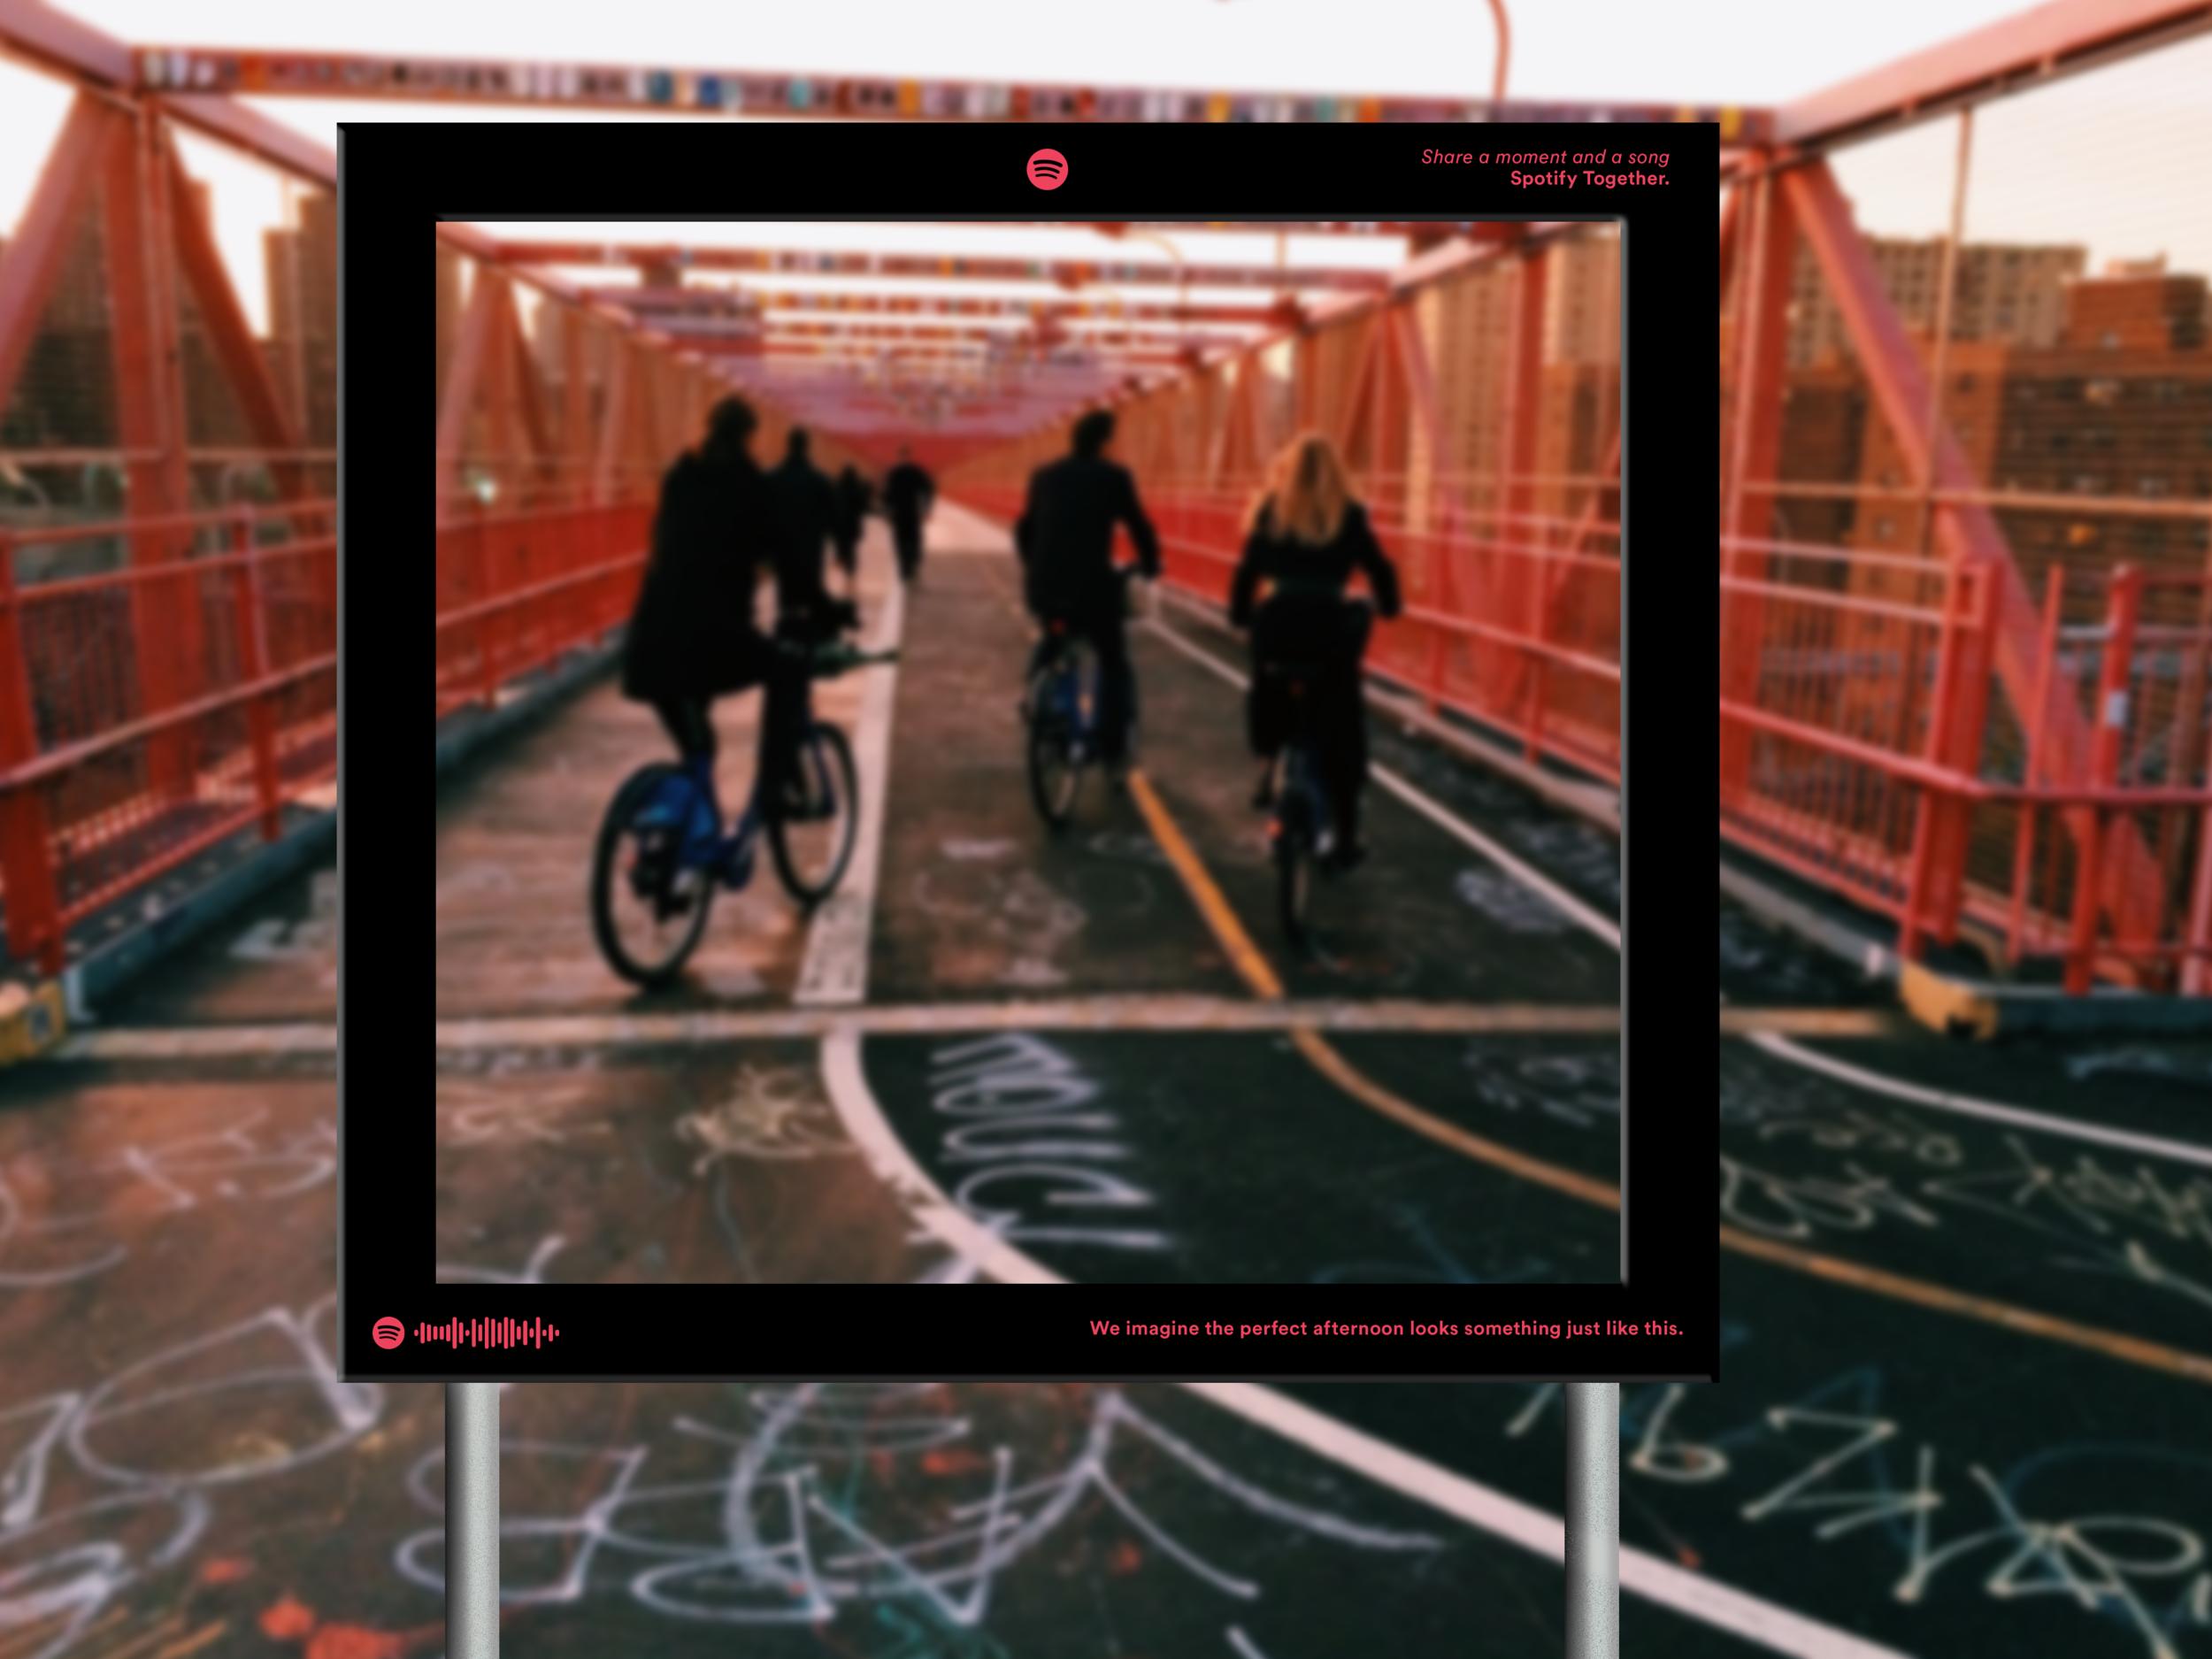 wmbg-bridge-perf-day_0001_frame-focus.png